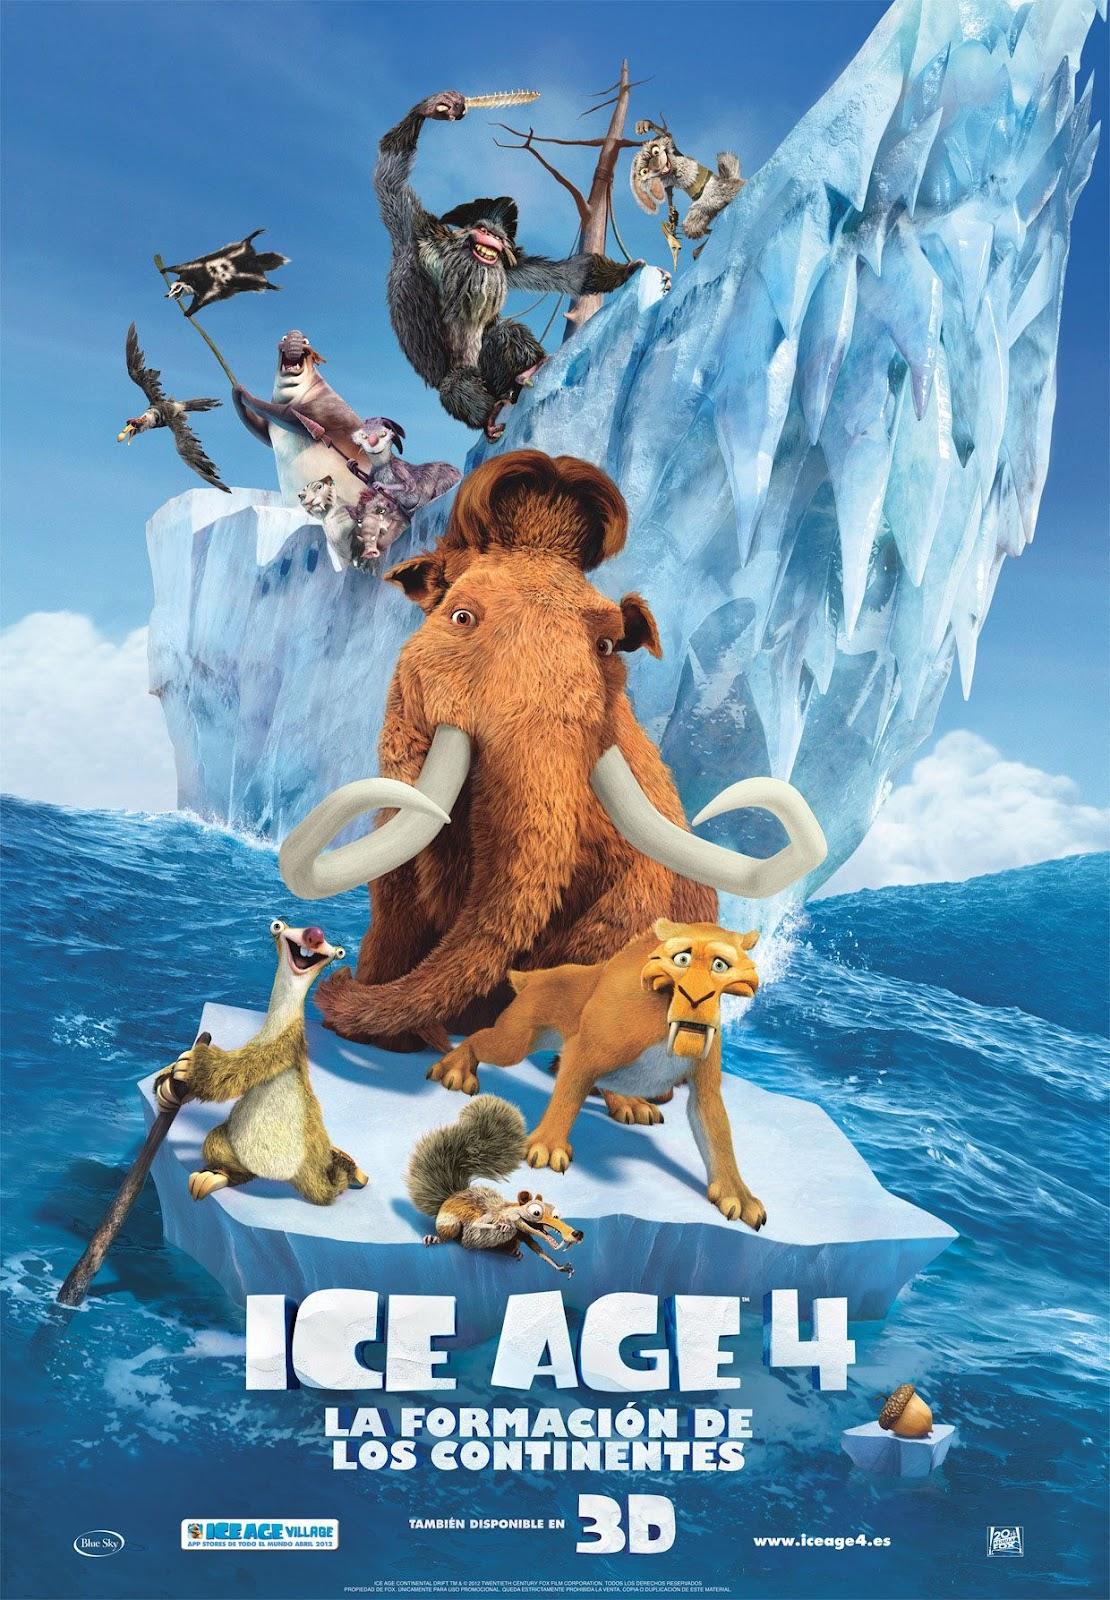 http://4.bp.blogspot.com/-qk_9chHQEVU/T9bYengc7dI/AAAAAAAAO5c/dI7zblQhXXk/s1600/la+era+del+hielo+4+ice+age+4+posters.jpg